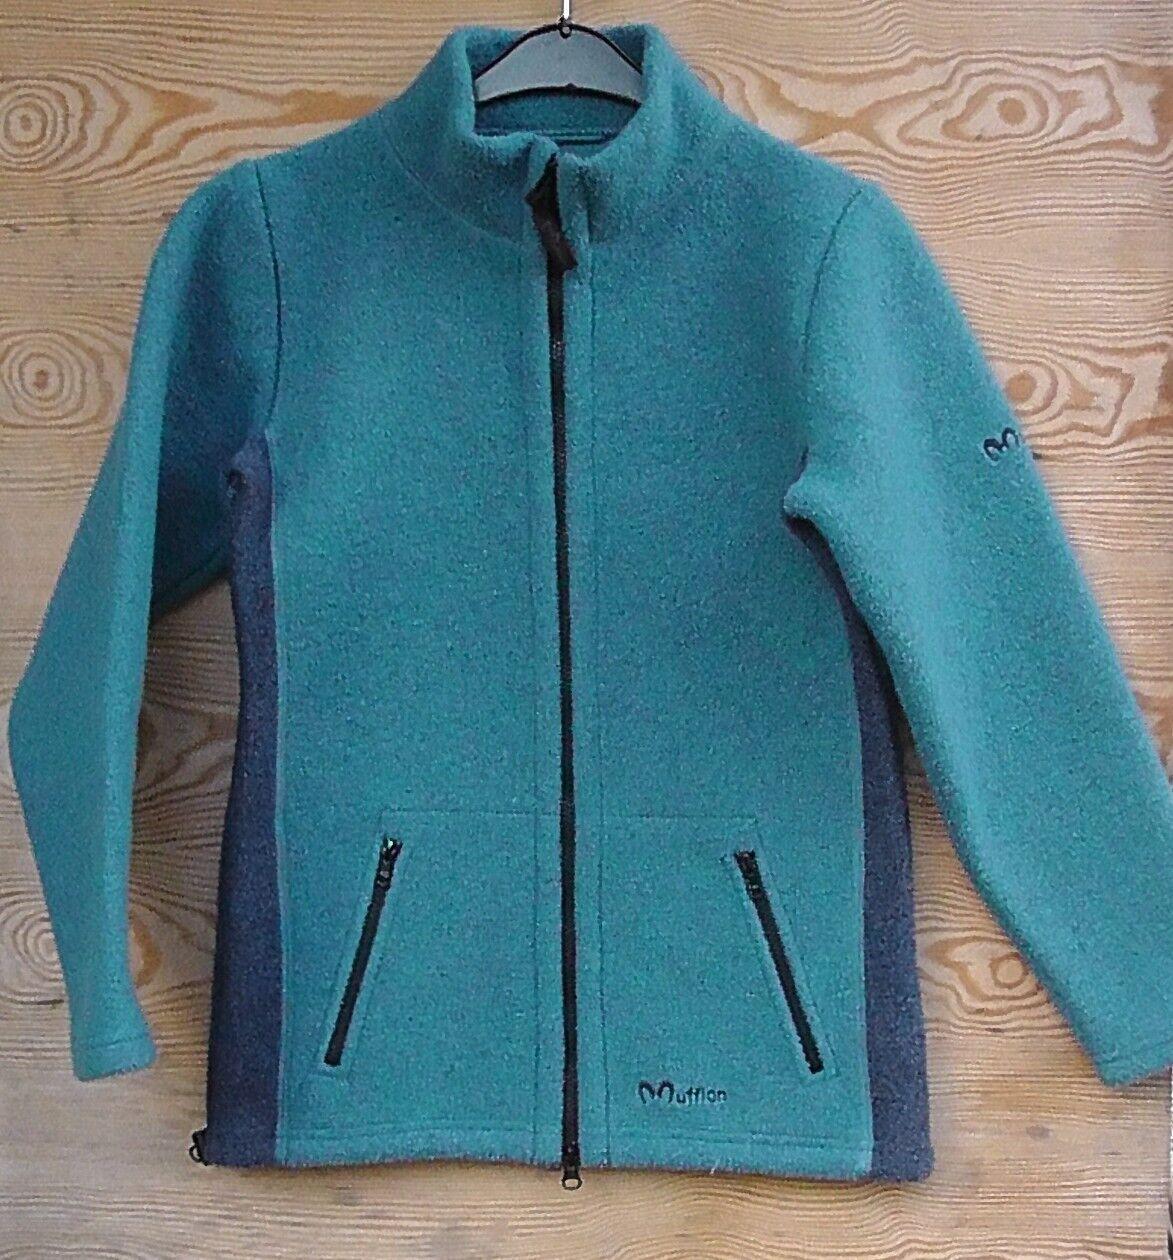 Muflón invierno-chaqueta lana milla para damas, talla xs, petrol